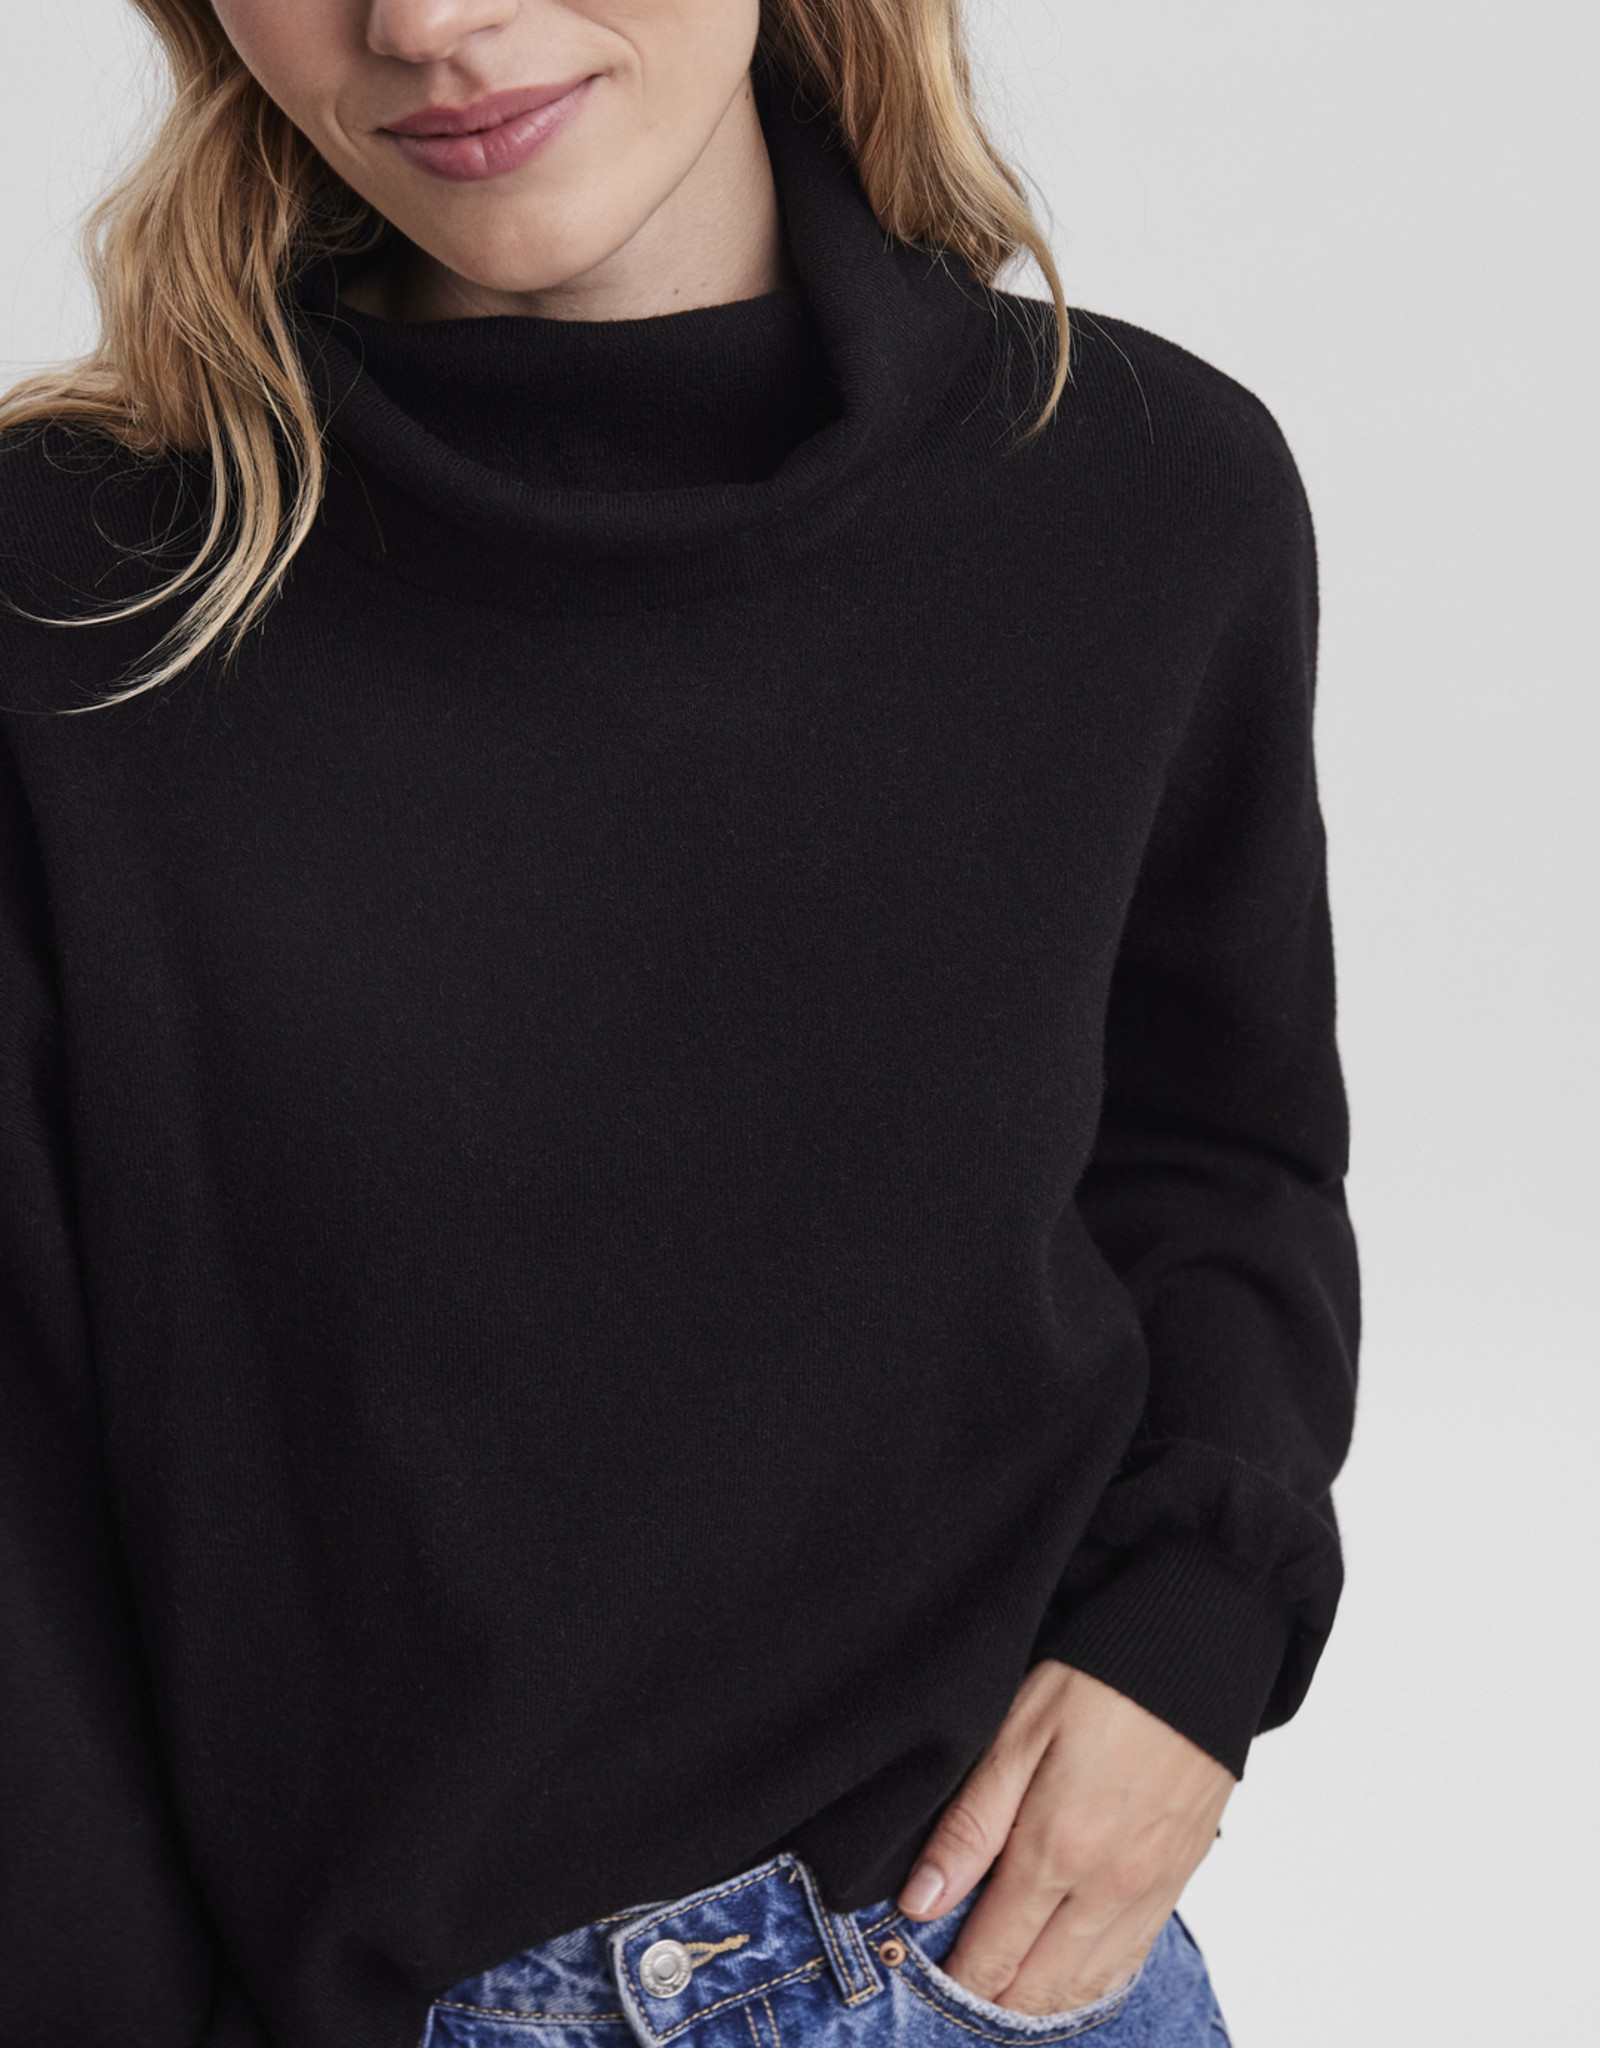 Vero Moda Nancy Cowlneck Sweater